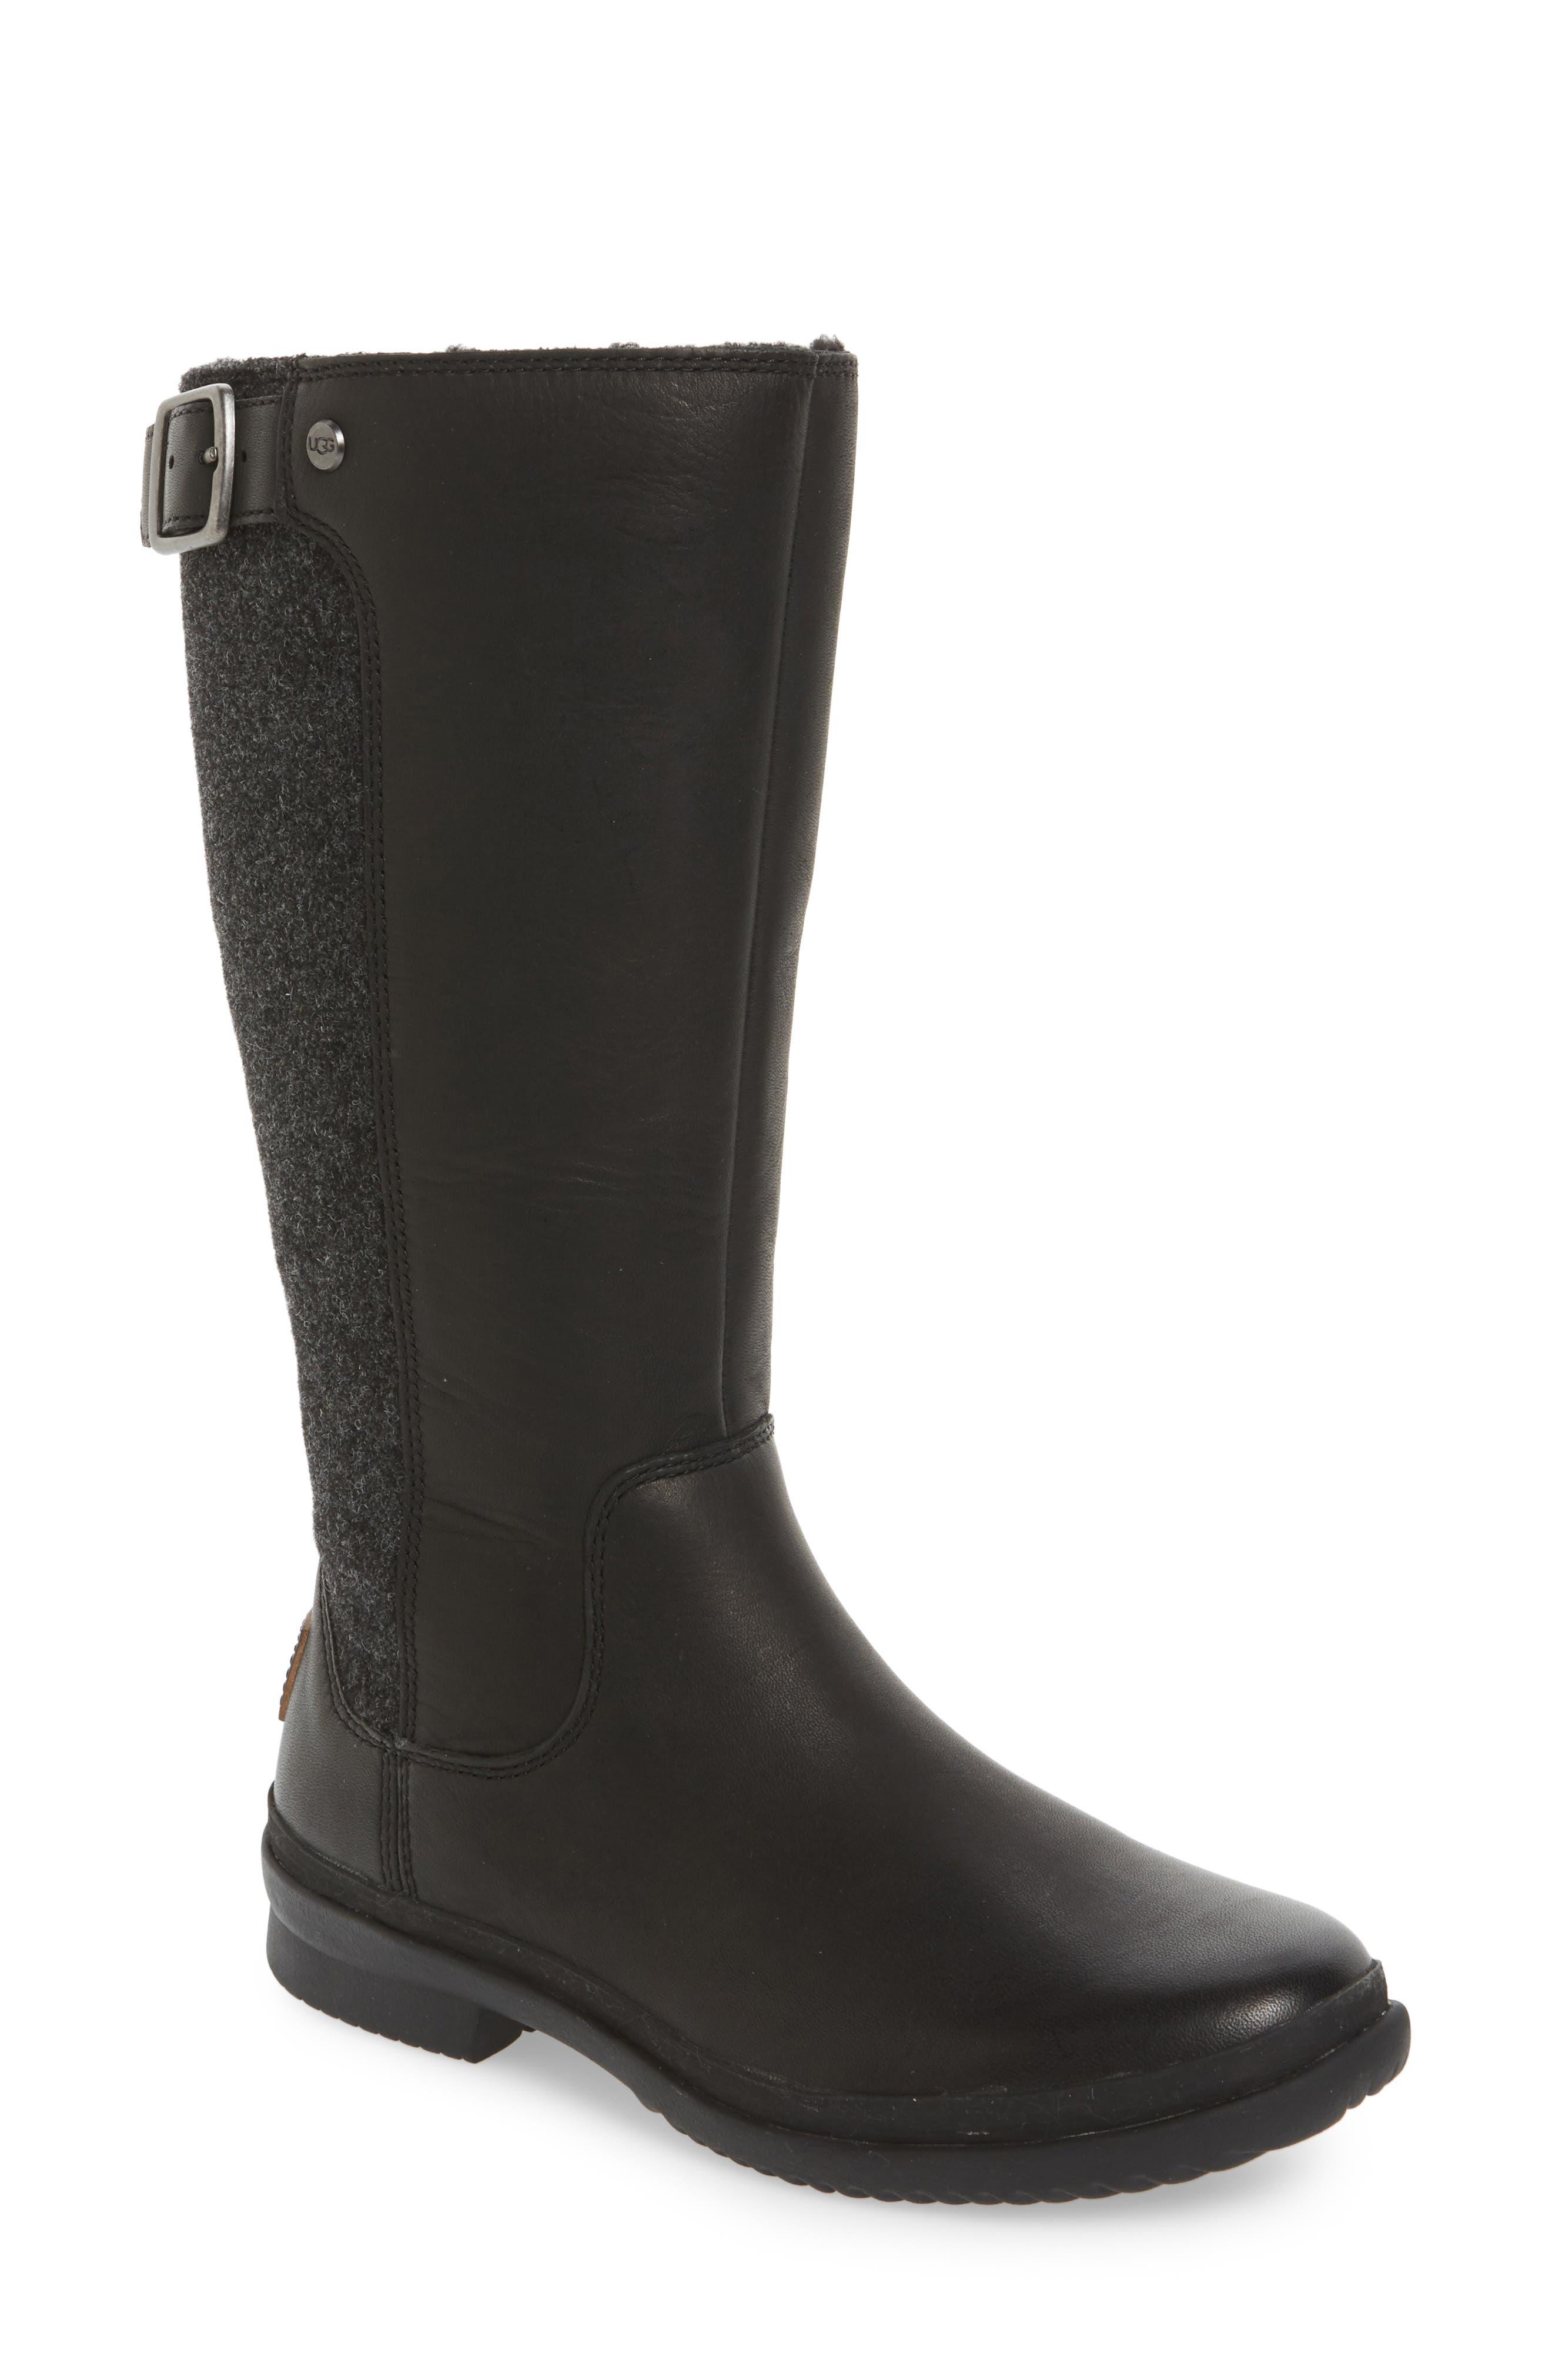 Janina Rain Boot,                             Main thumbnail 1, color,                             Black Leather